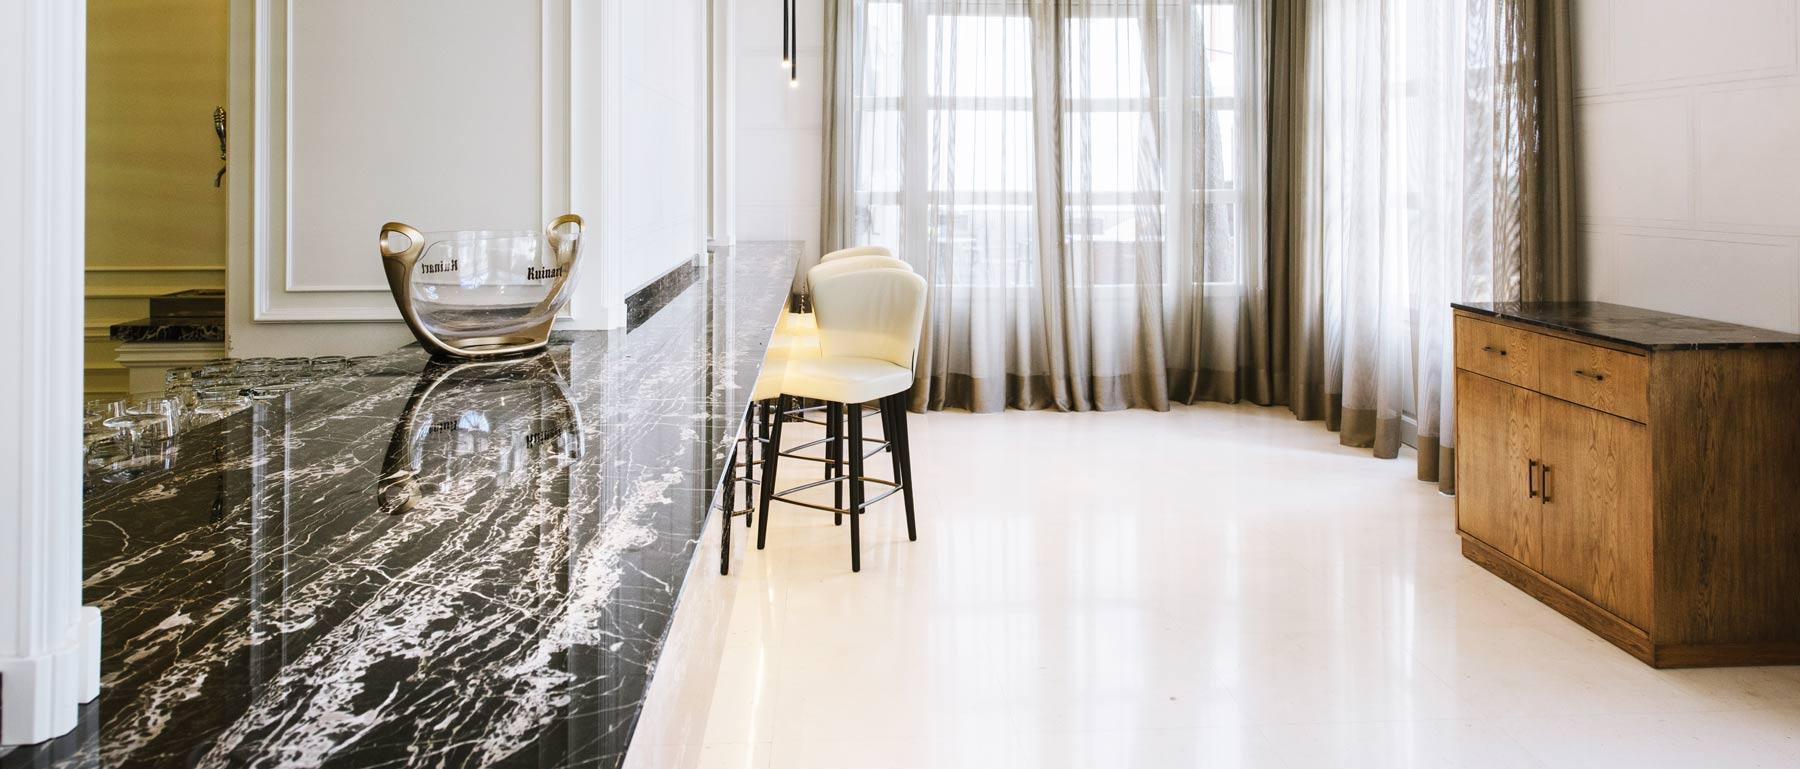 Proyectos de mármol y piedra natural - Natural stone and marble projects